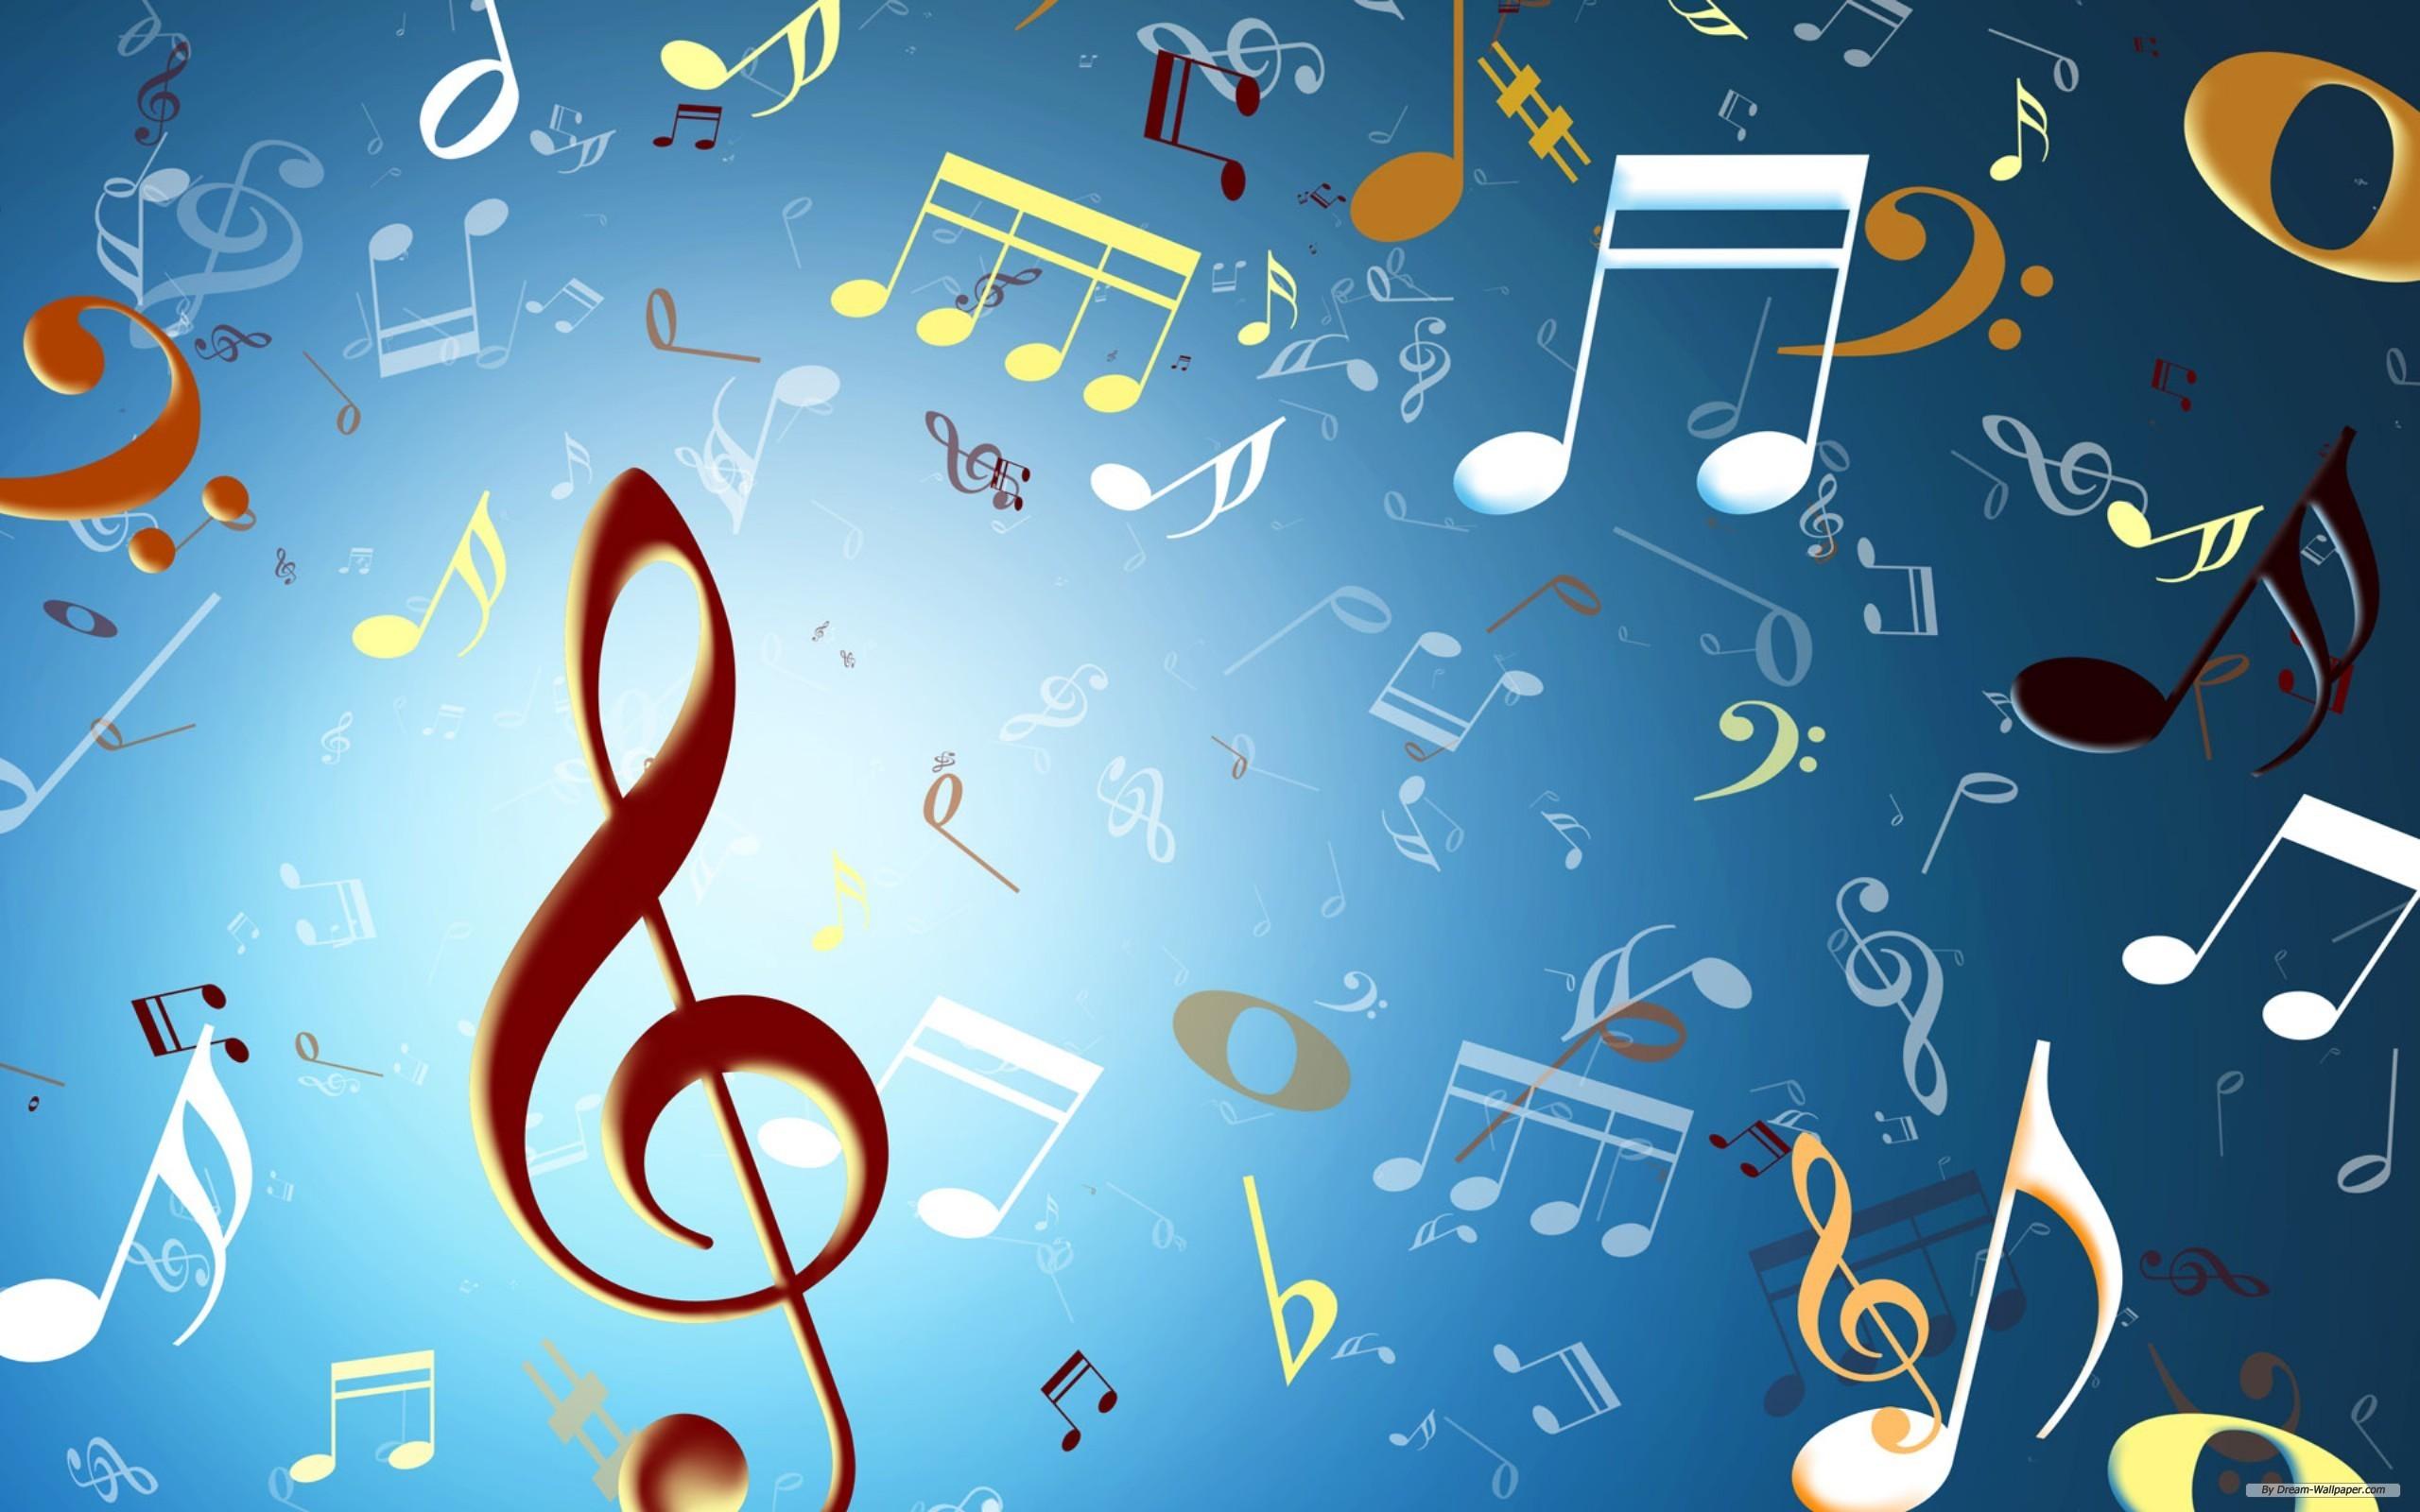 artistic music Wallpaper Backgrounds